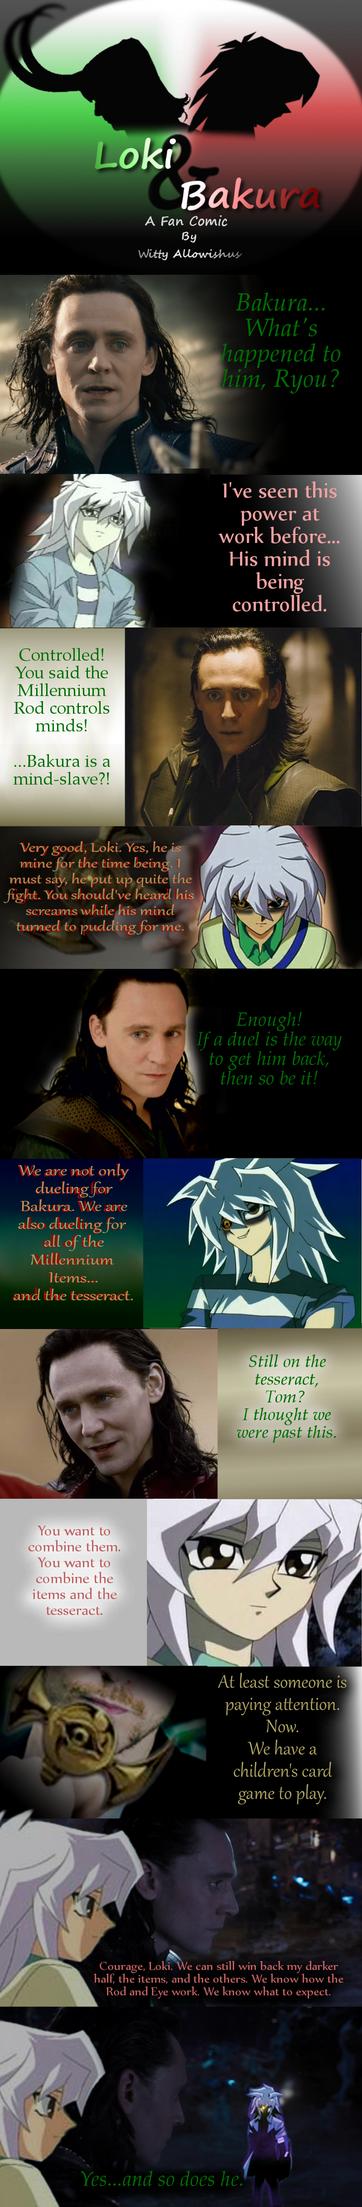 Loki and Bakura XXXVI - The Terms by Loki-Bakura